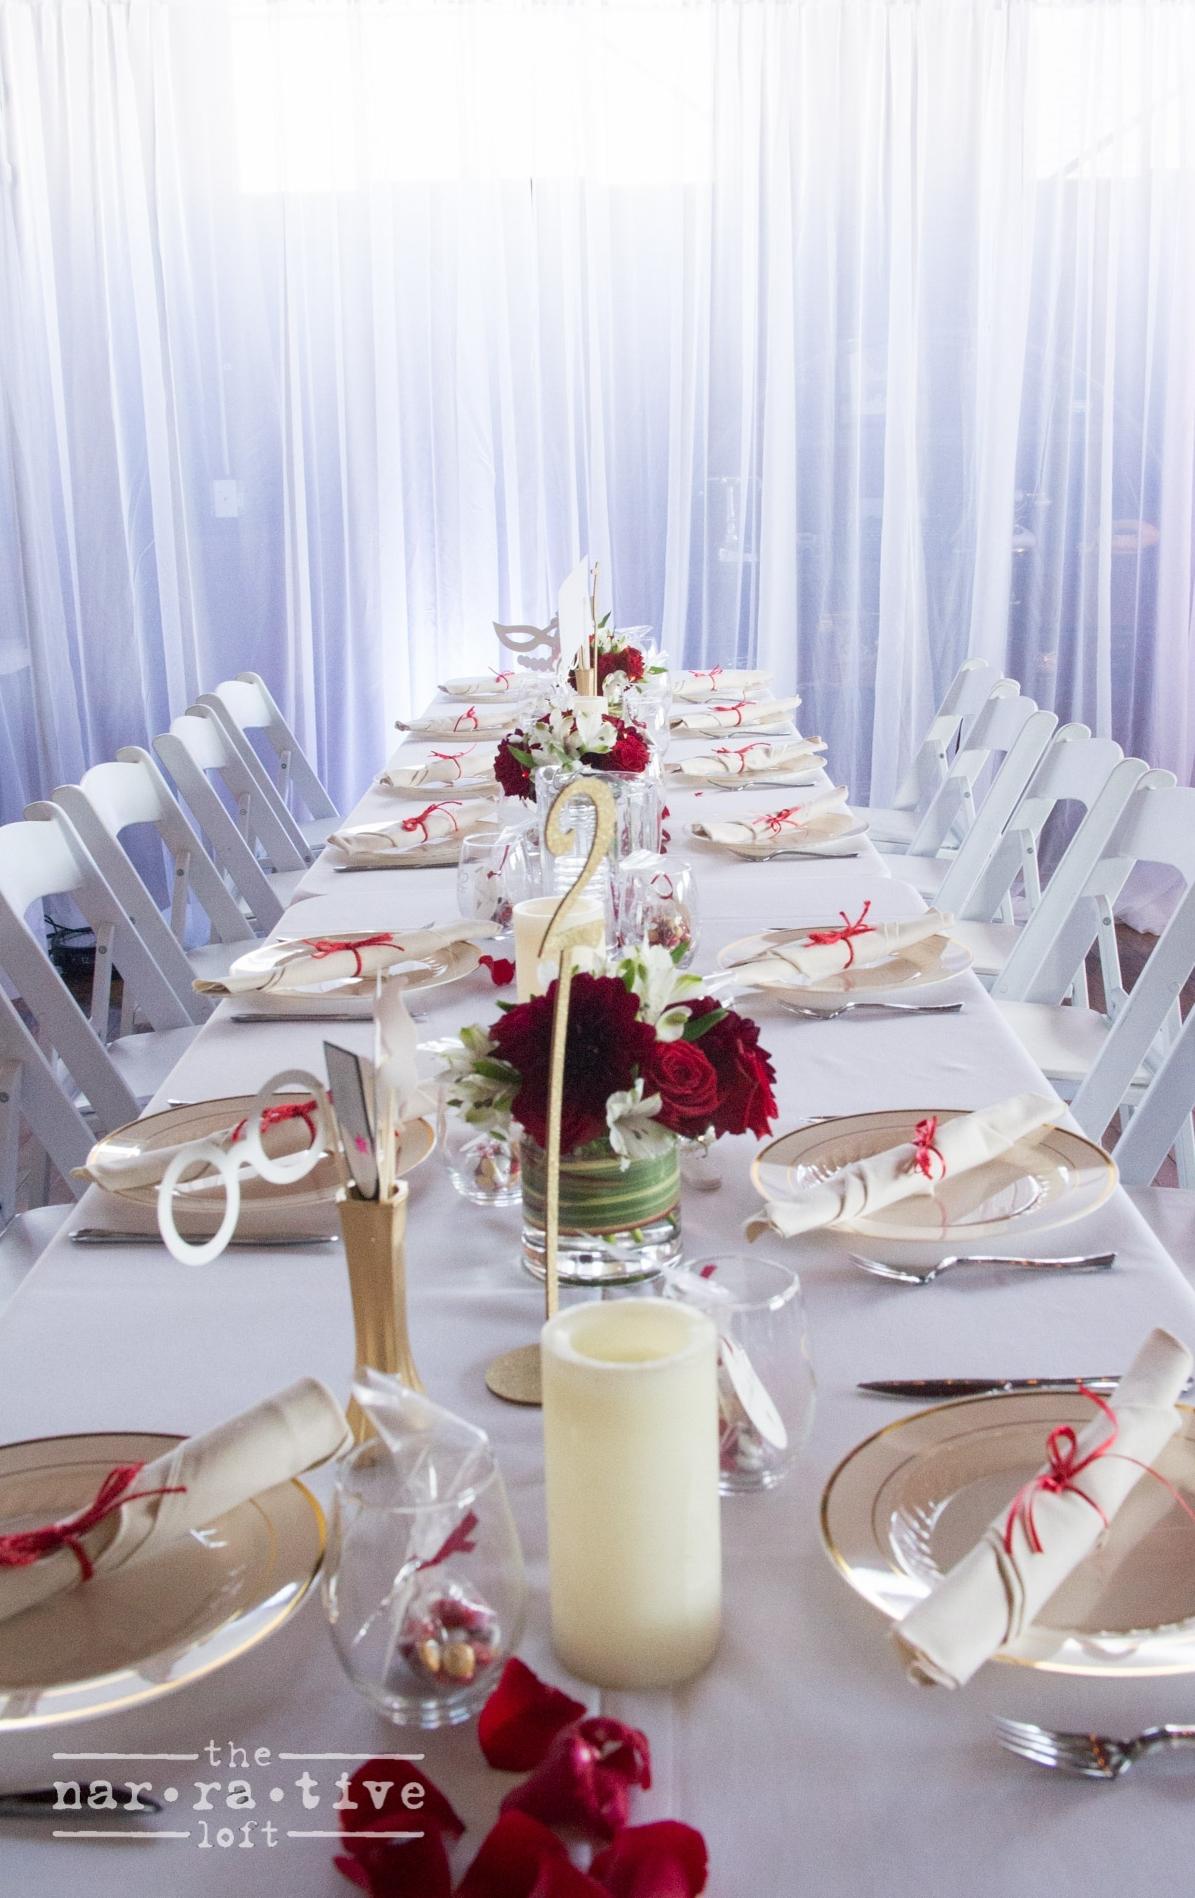 thenarrativeloft-wedding-reception